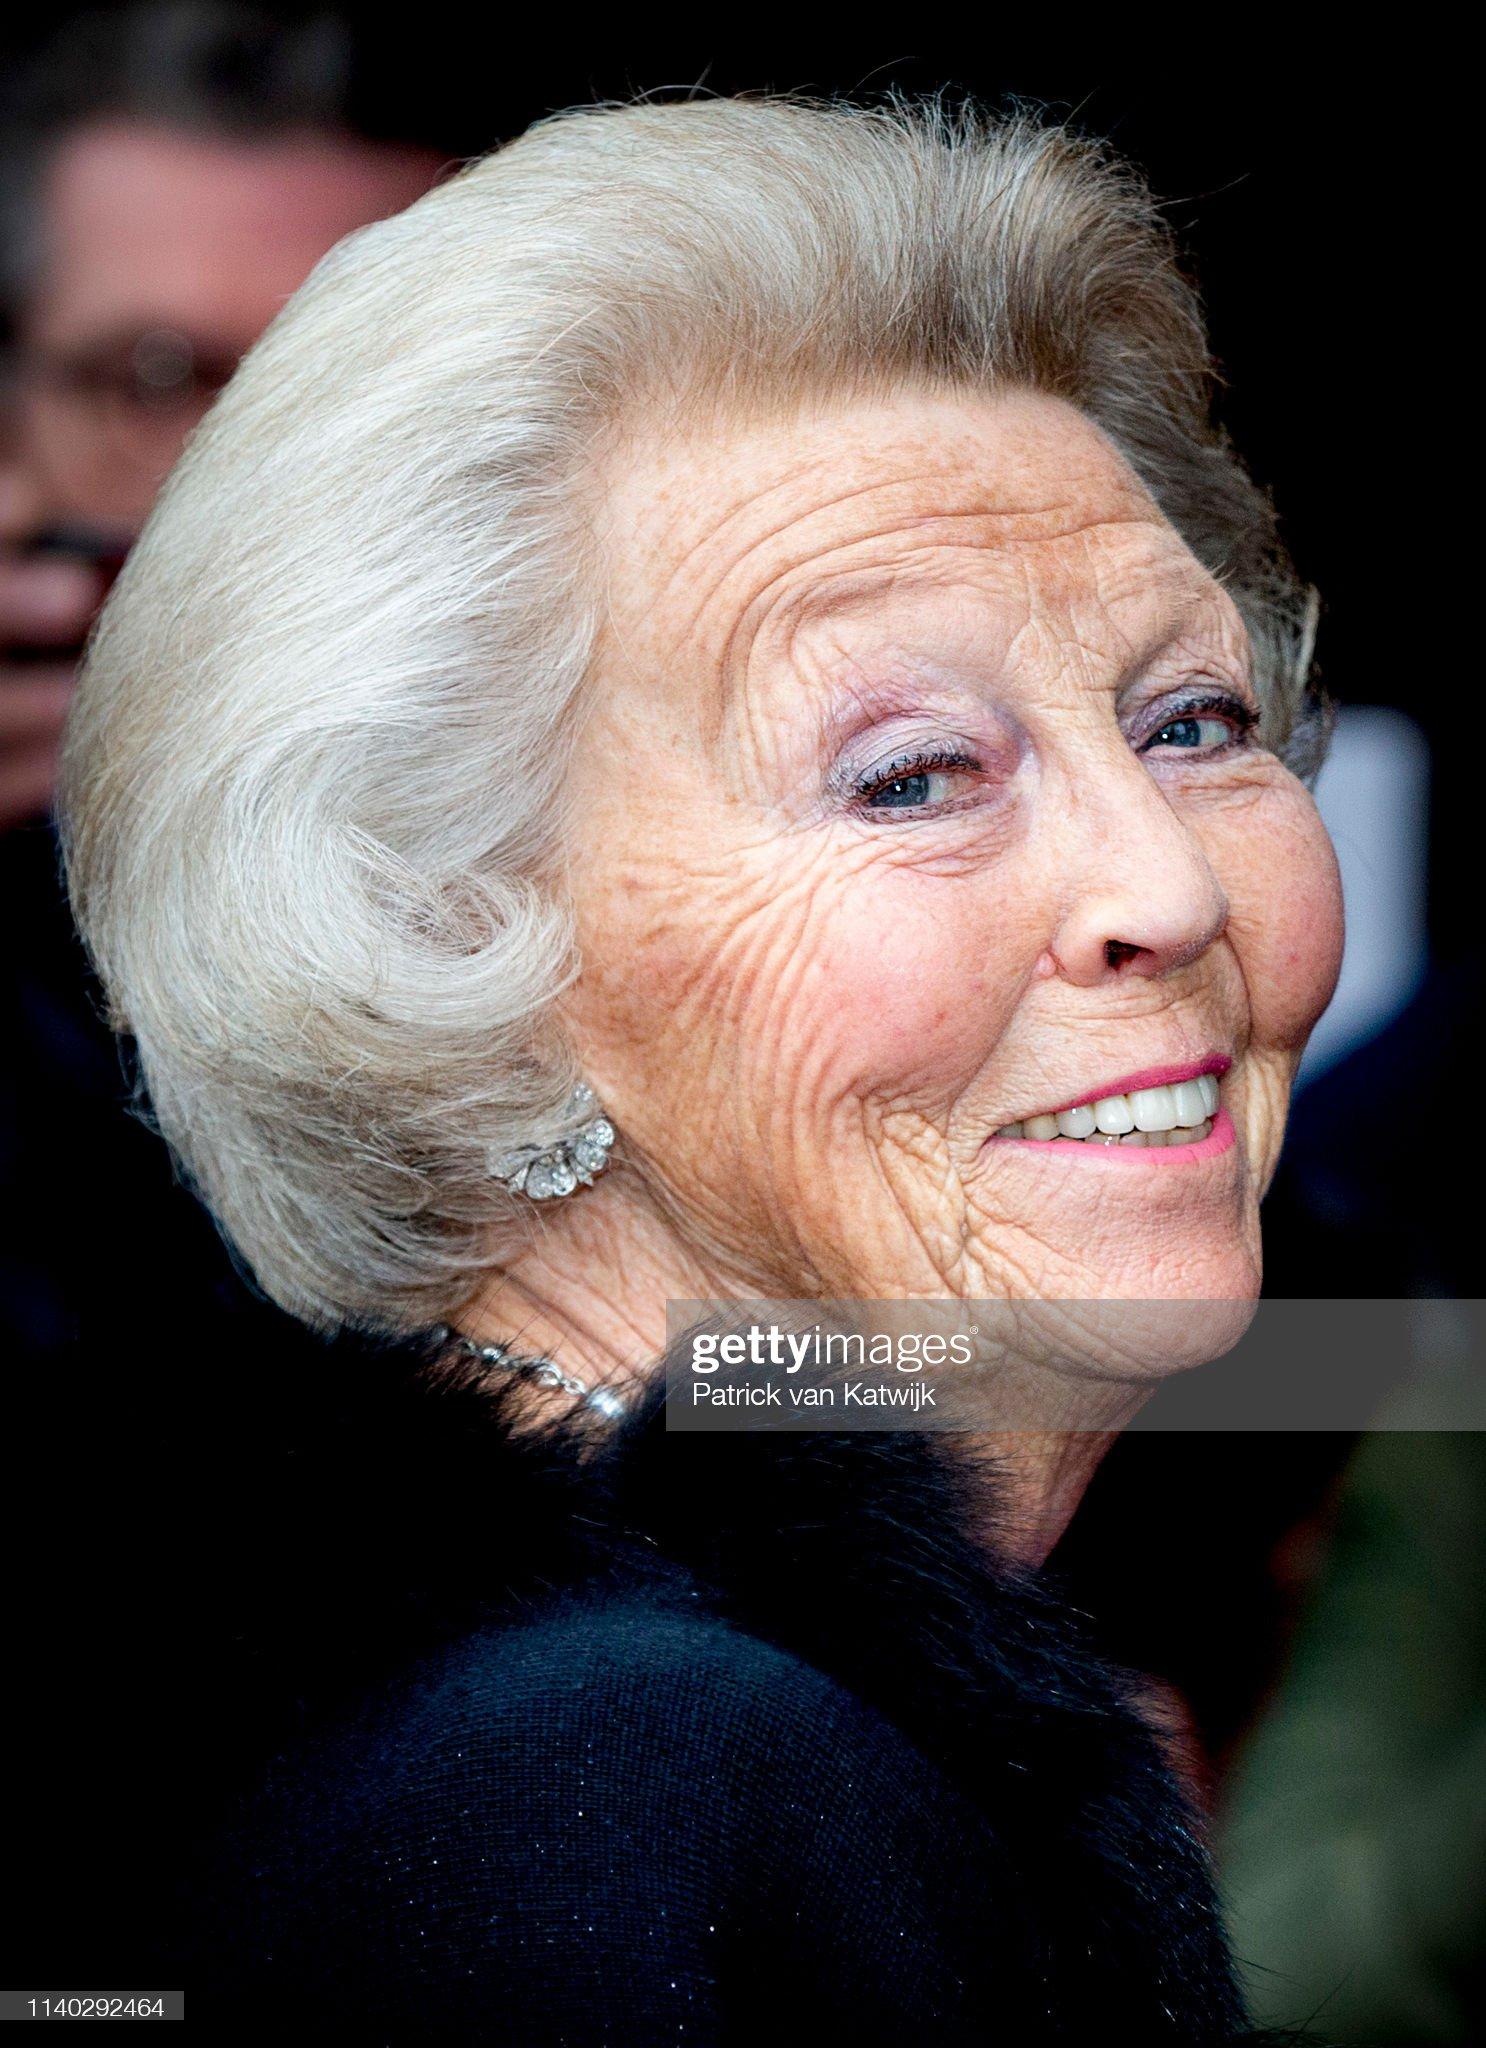 Dutch Royal Family Celebrates Pieter van Vollenhoven's 80th Birthday In Apeldoorn : News Photo